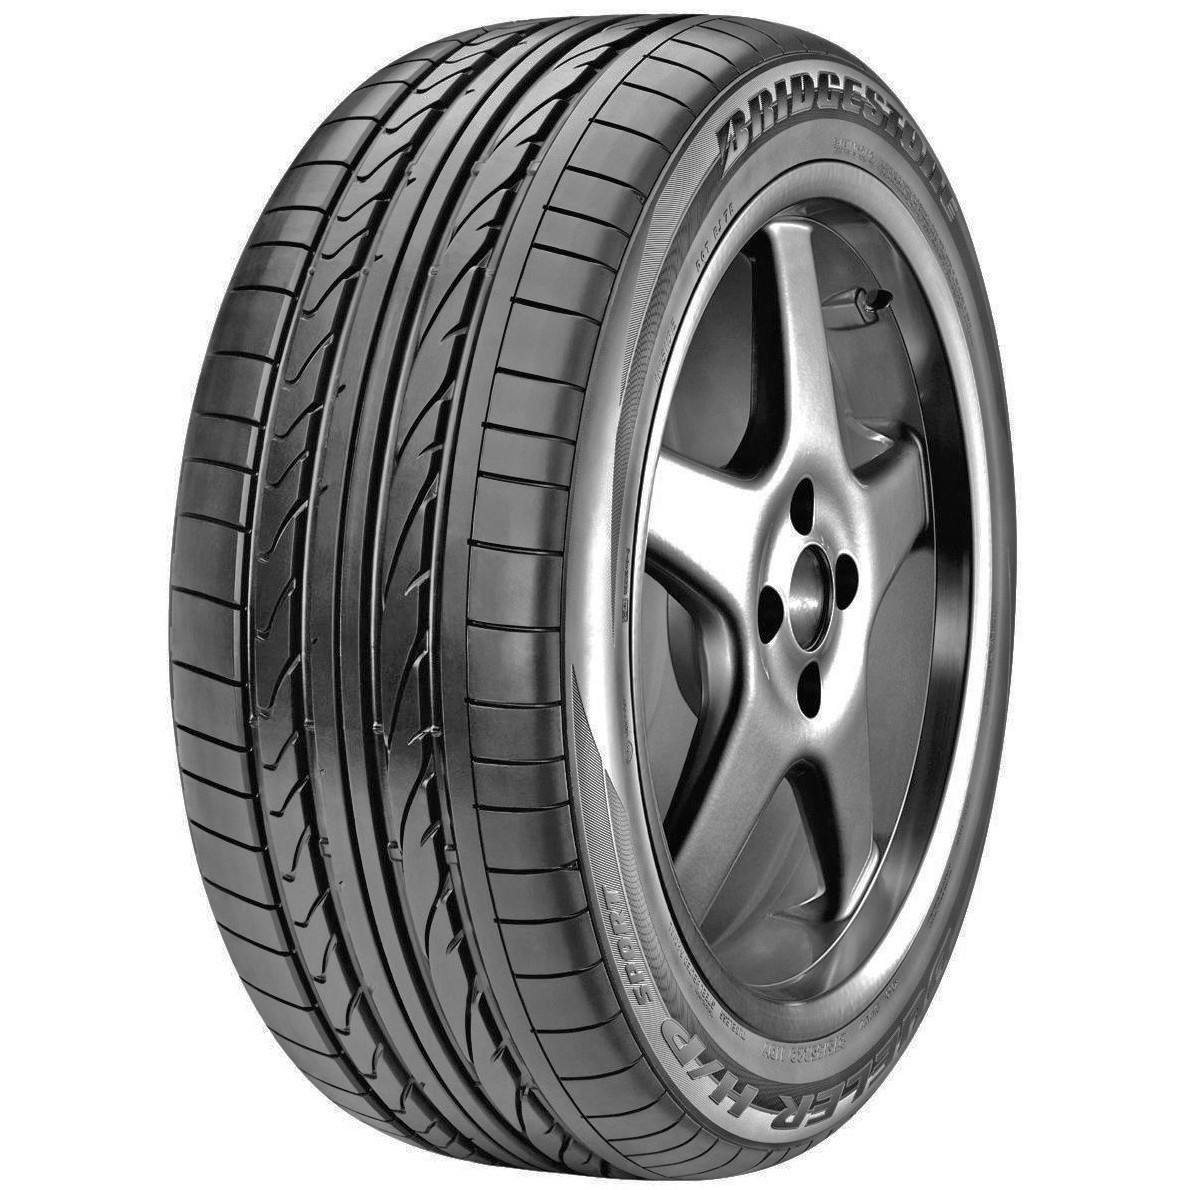 Bridgestone Dueler H/P Sport 235/65 R17 108V XL